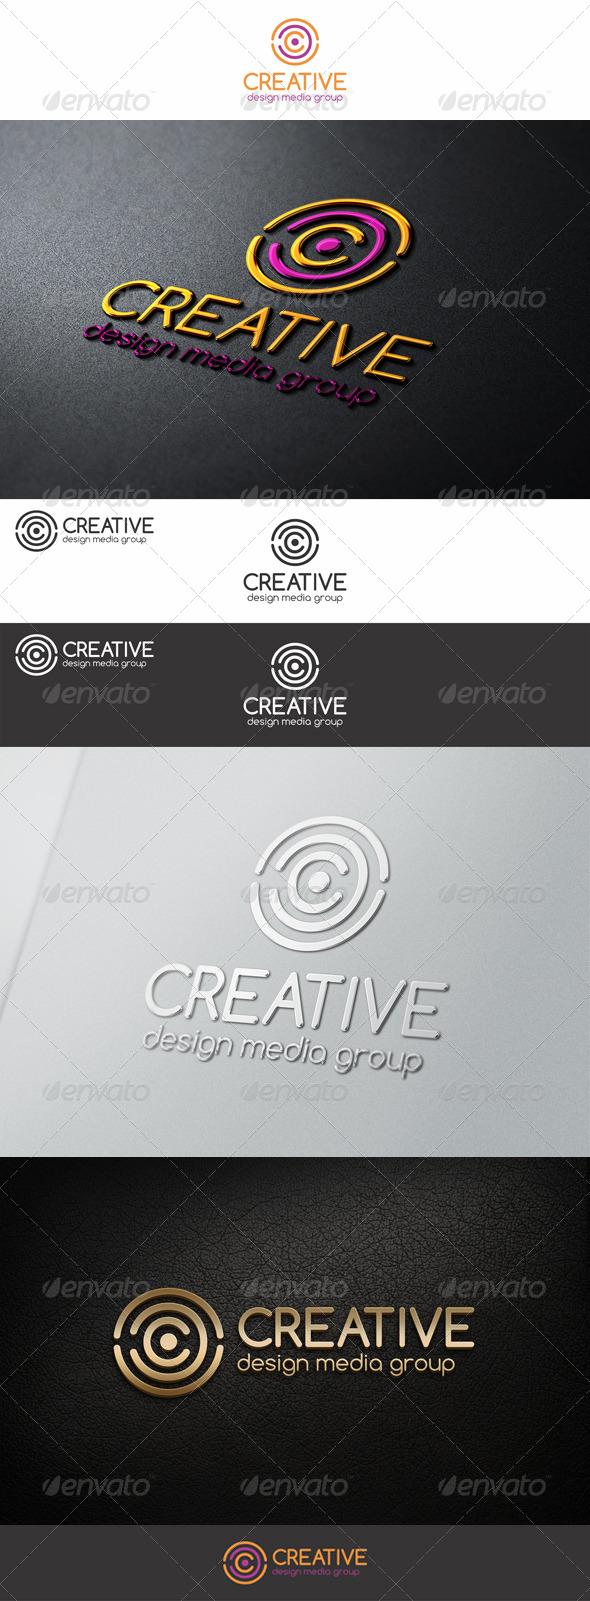 GraphicRiver Creative Circles C Letter Logo 7684672